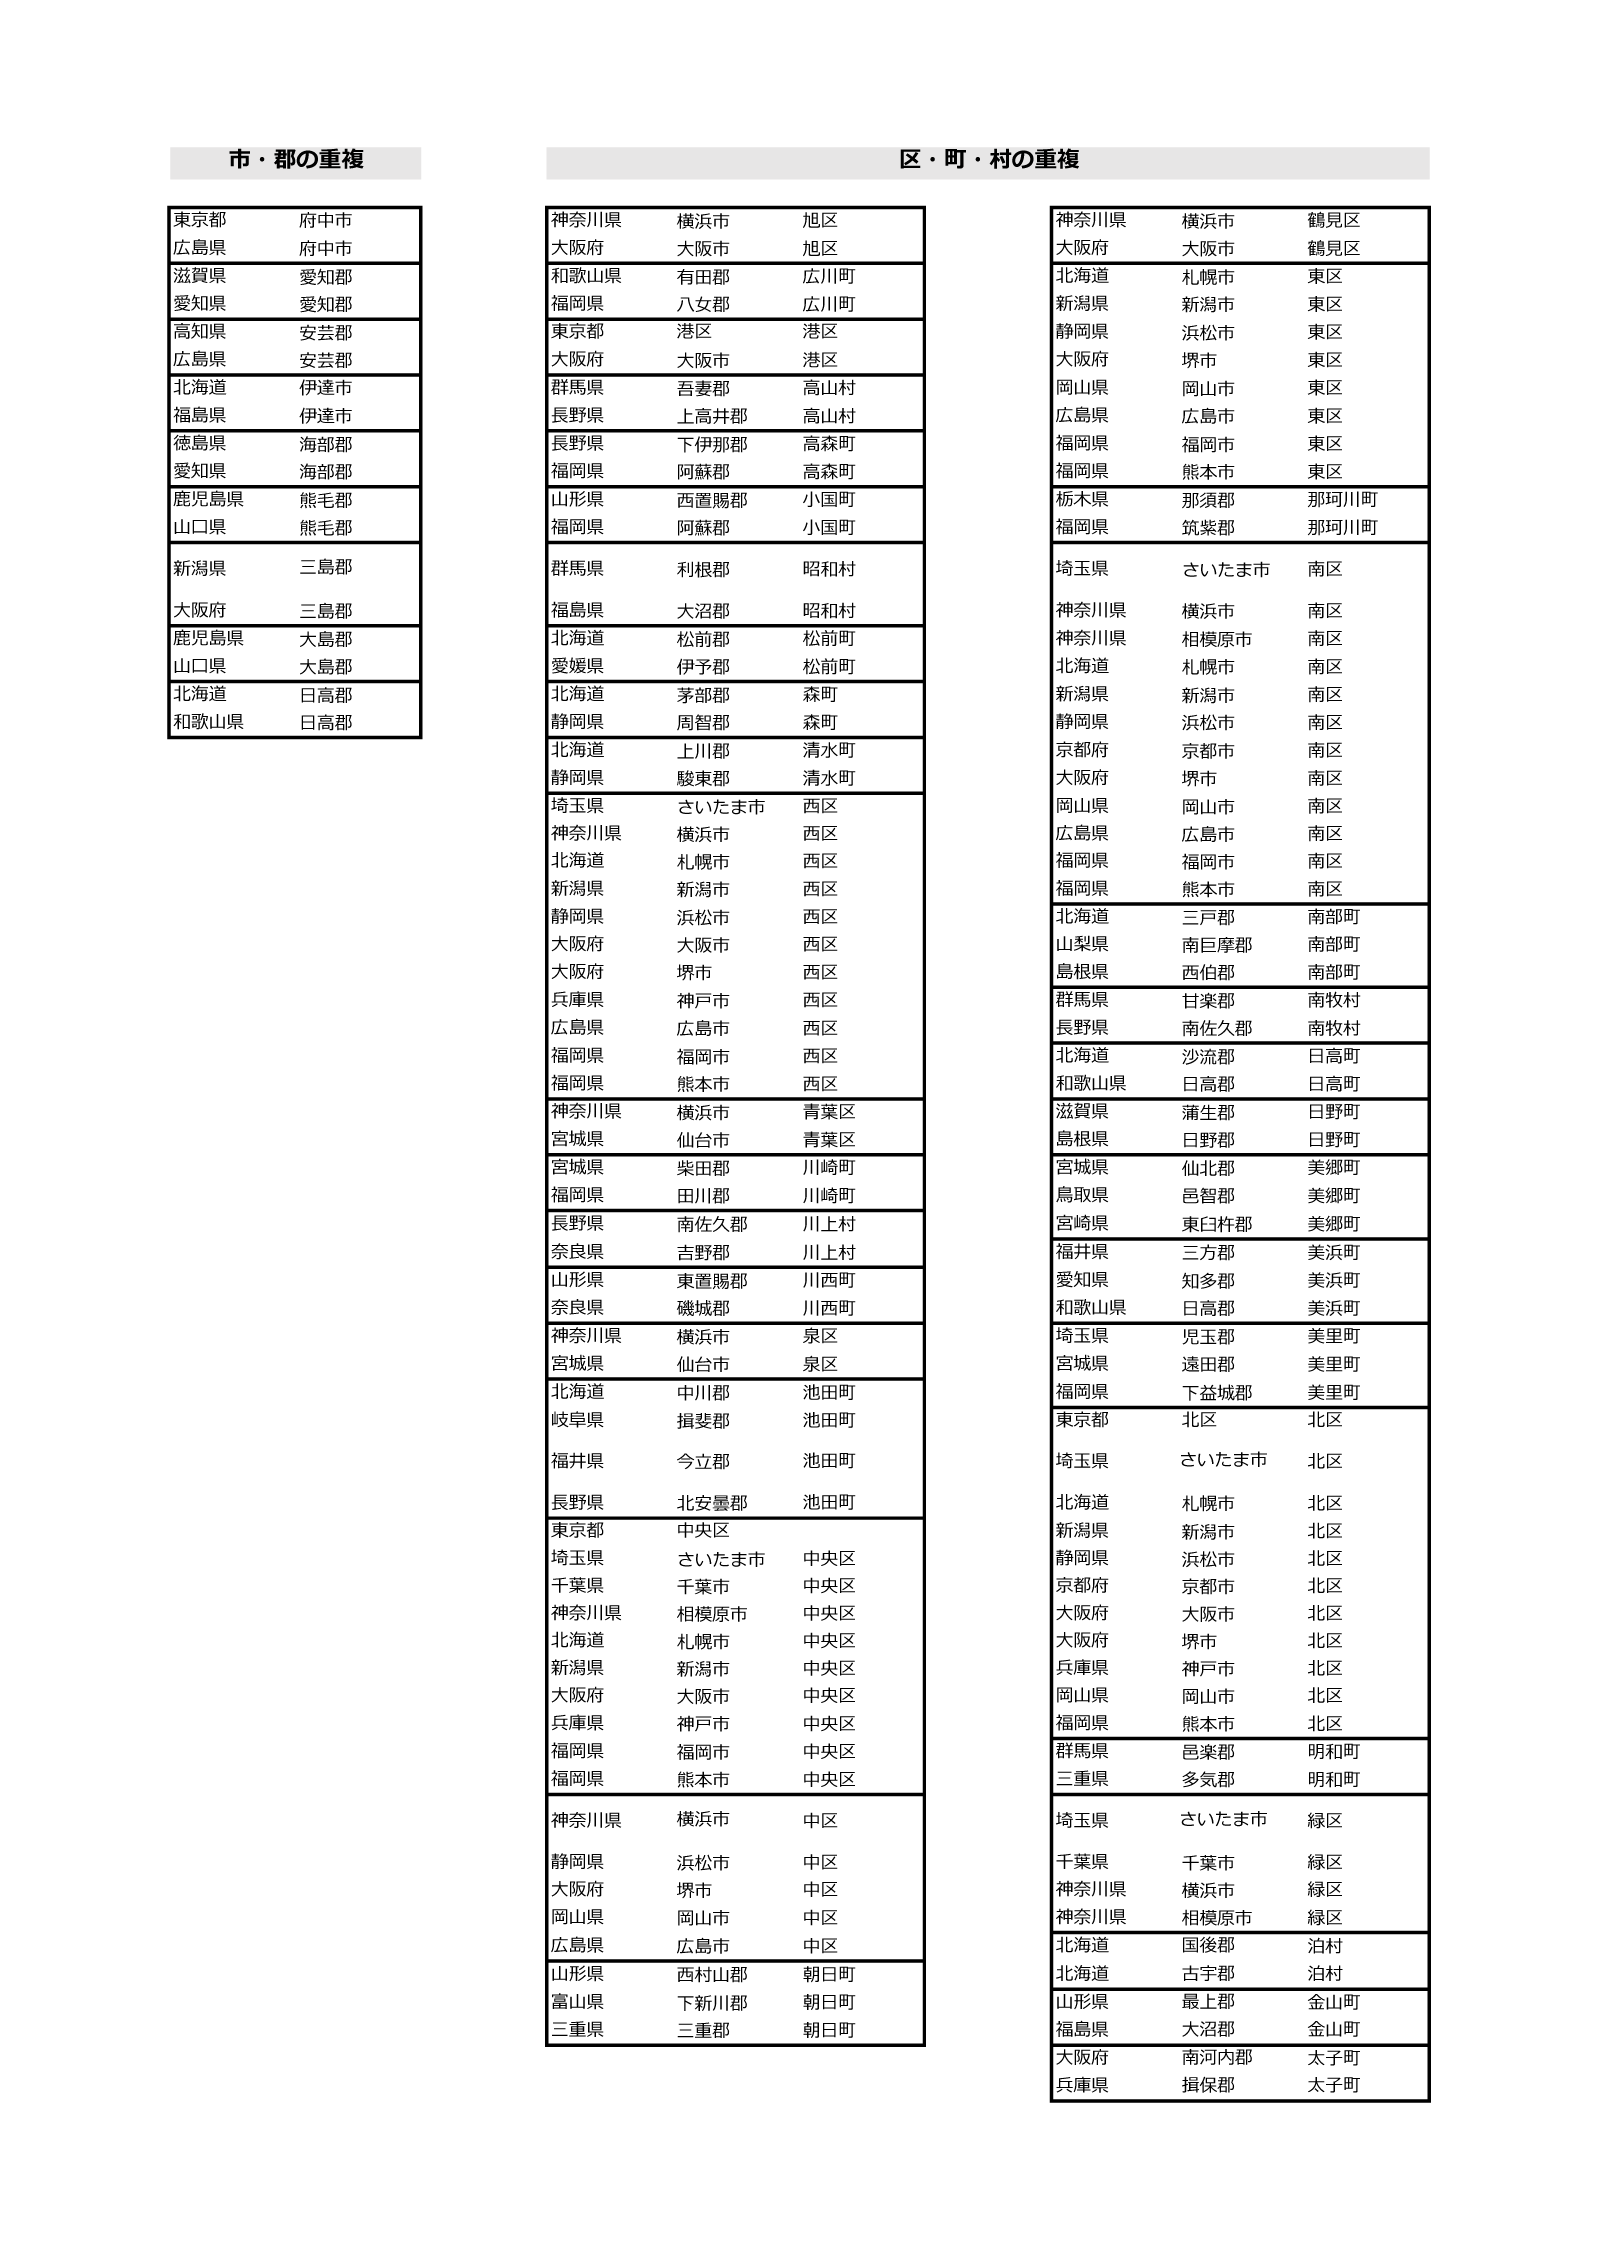 全国市郡一覧の重複